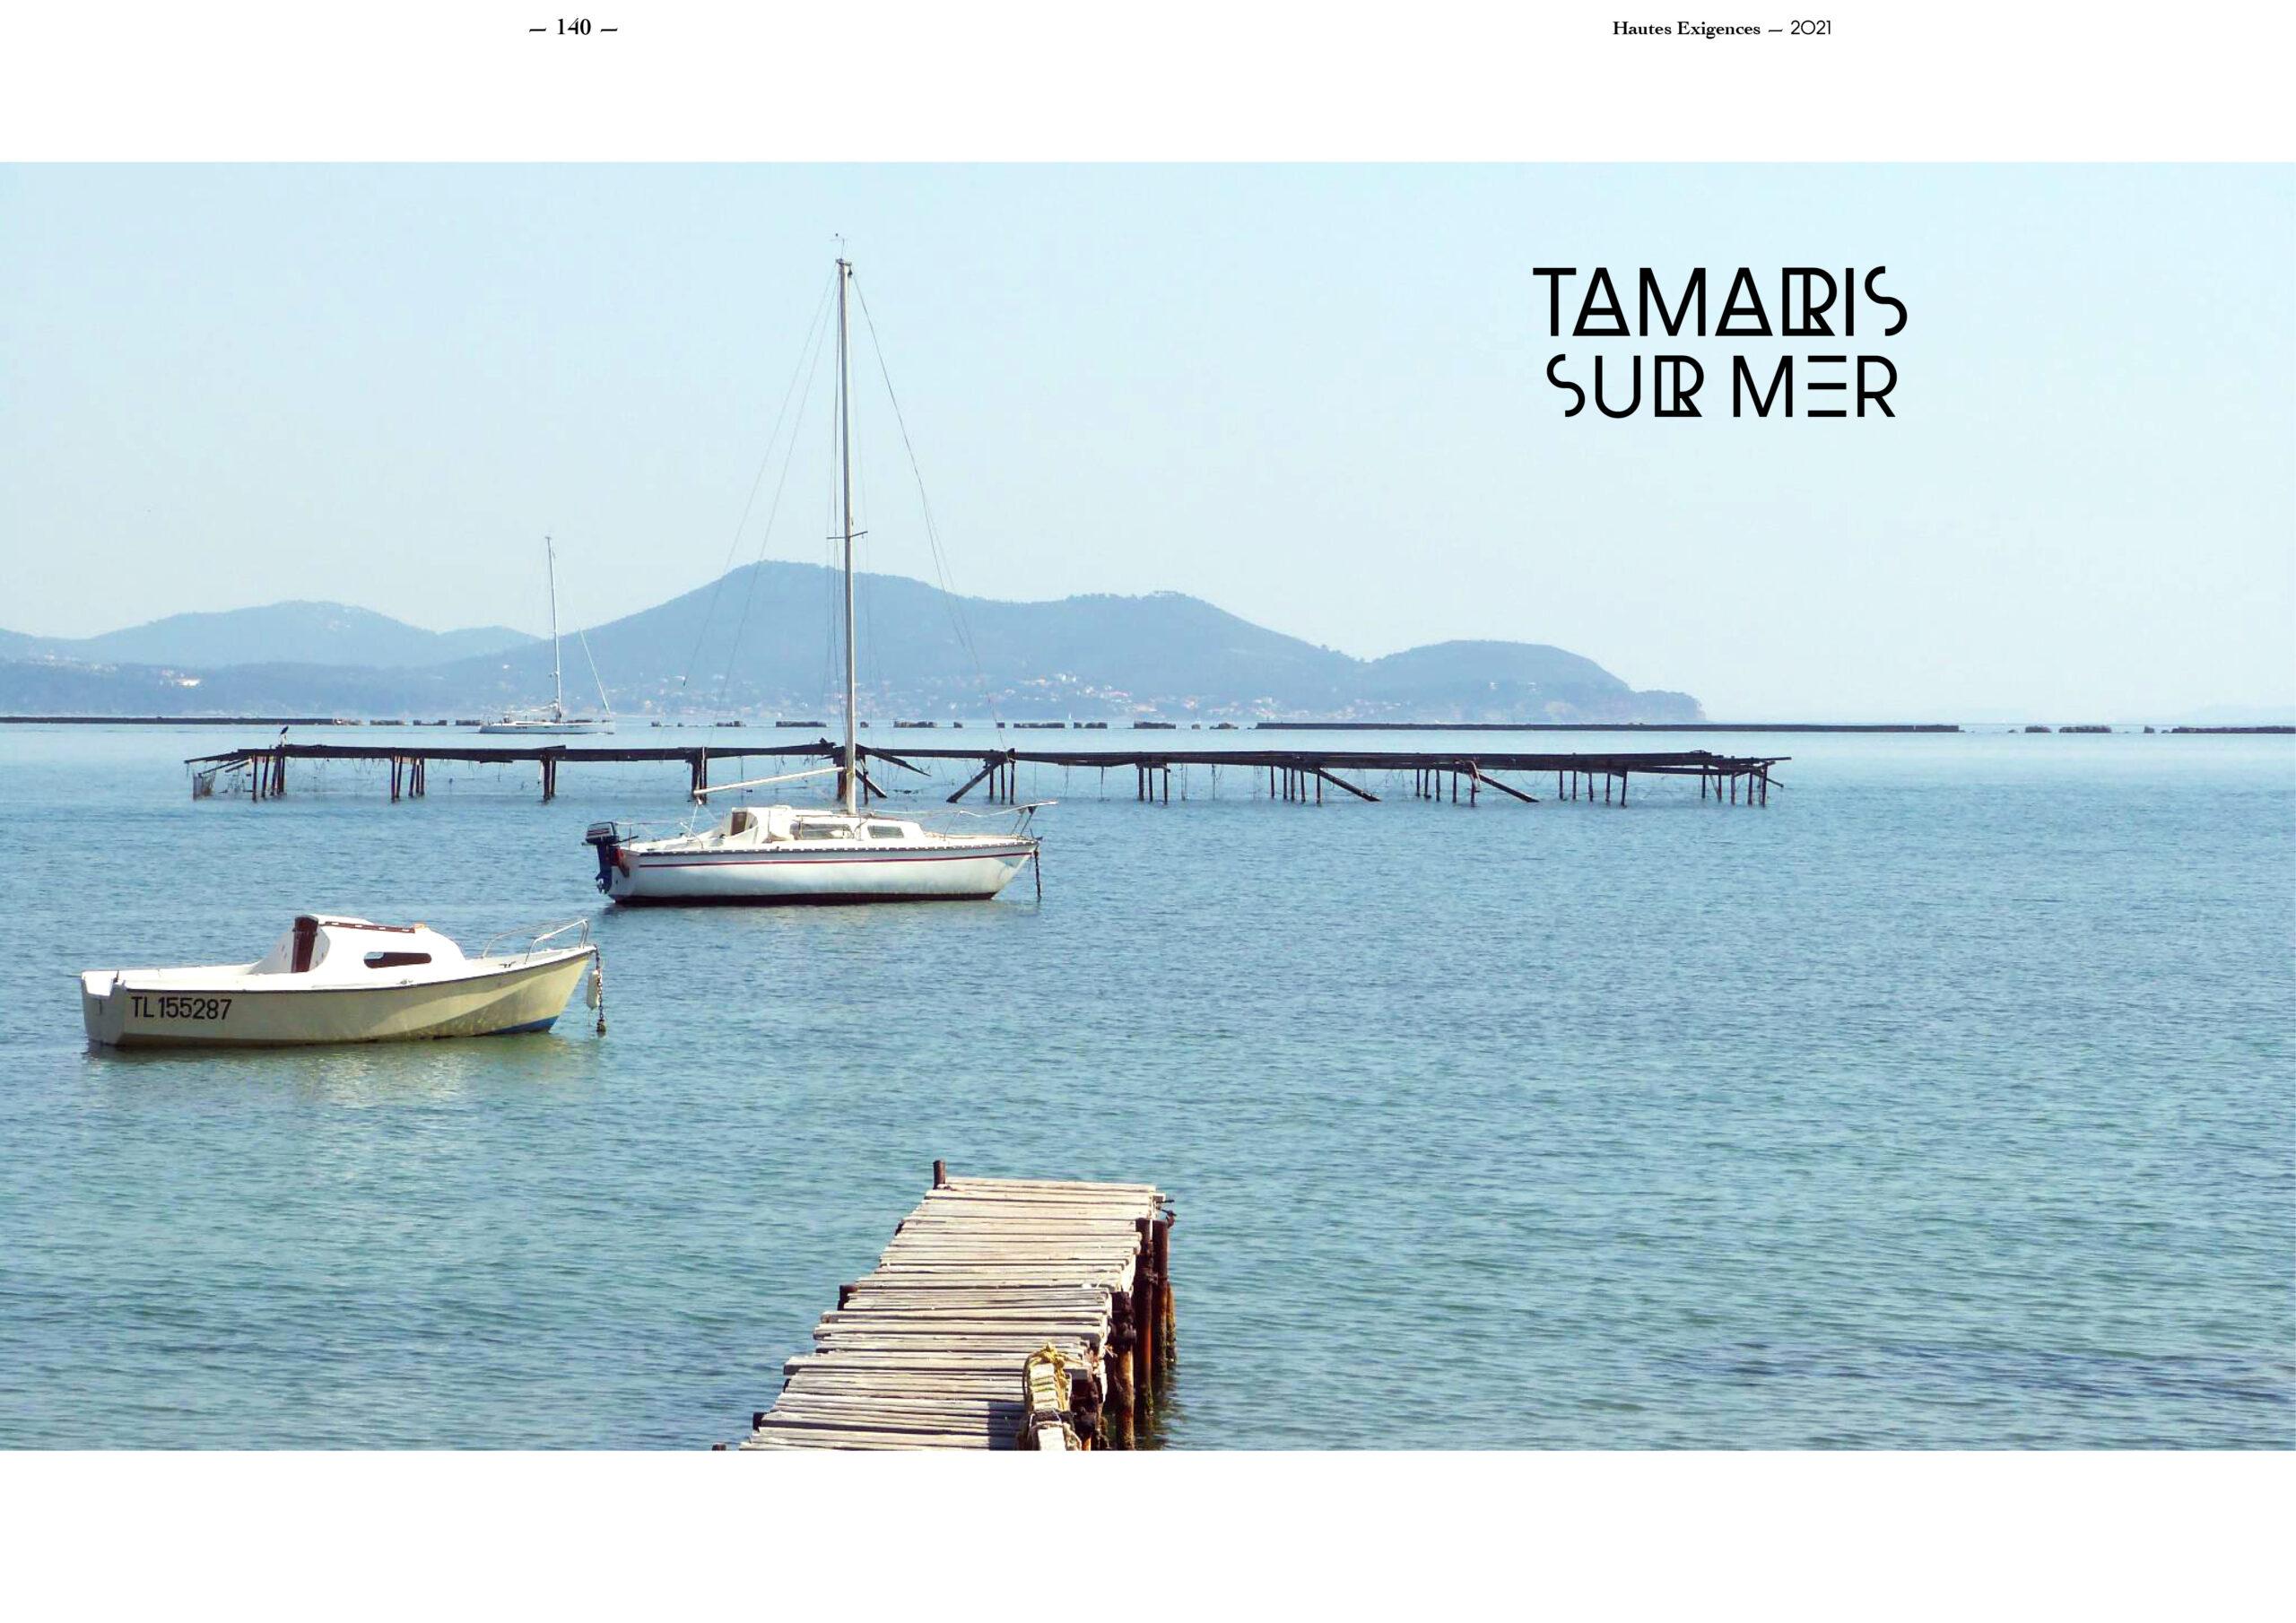 Hautes Exigences Magazine Hors Serie 2021 page 138-139